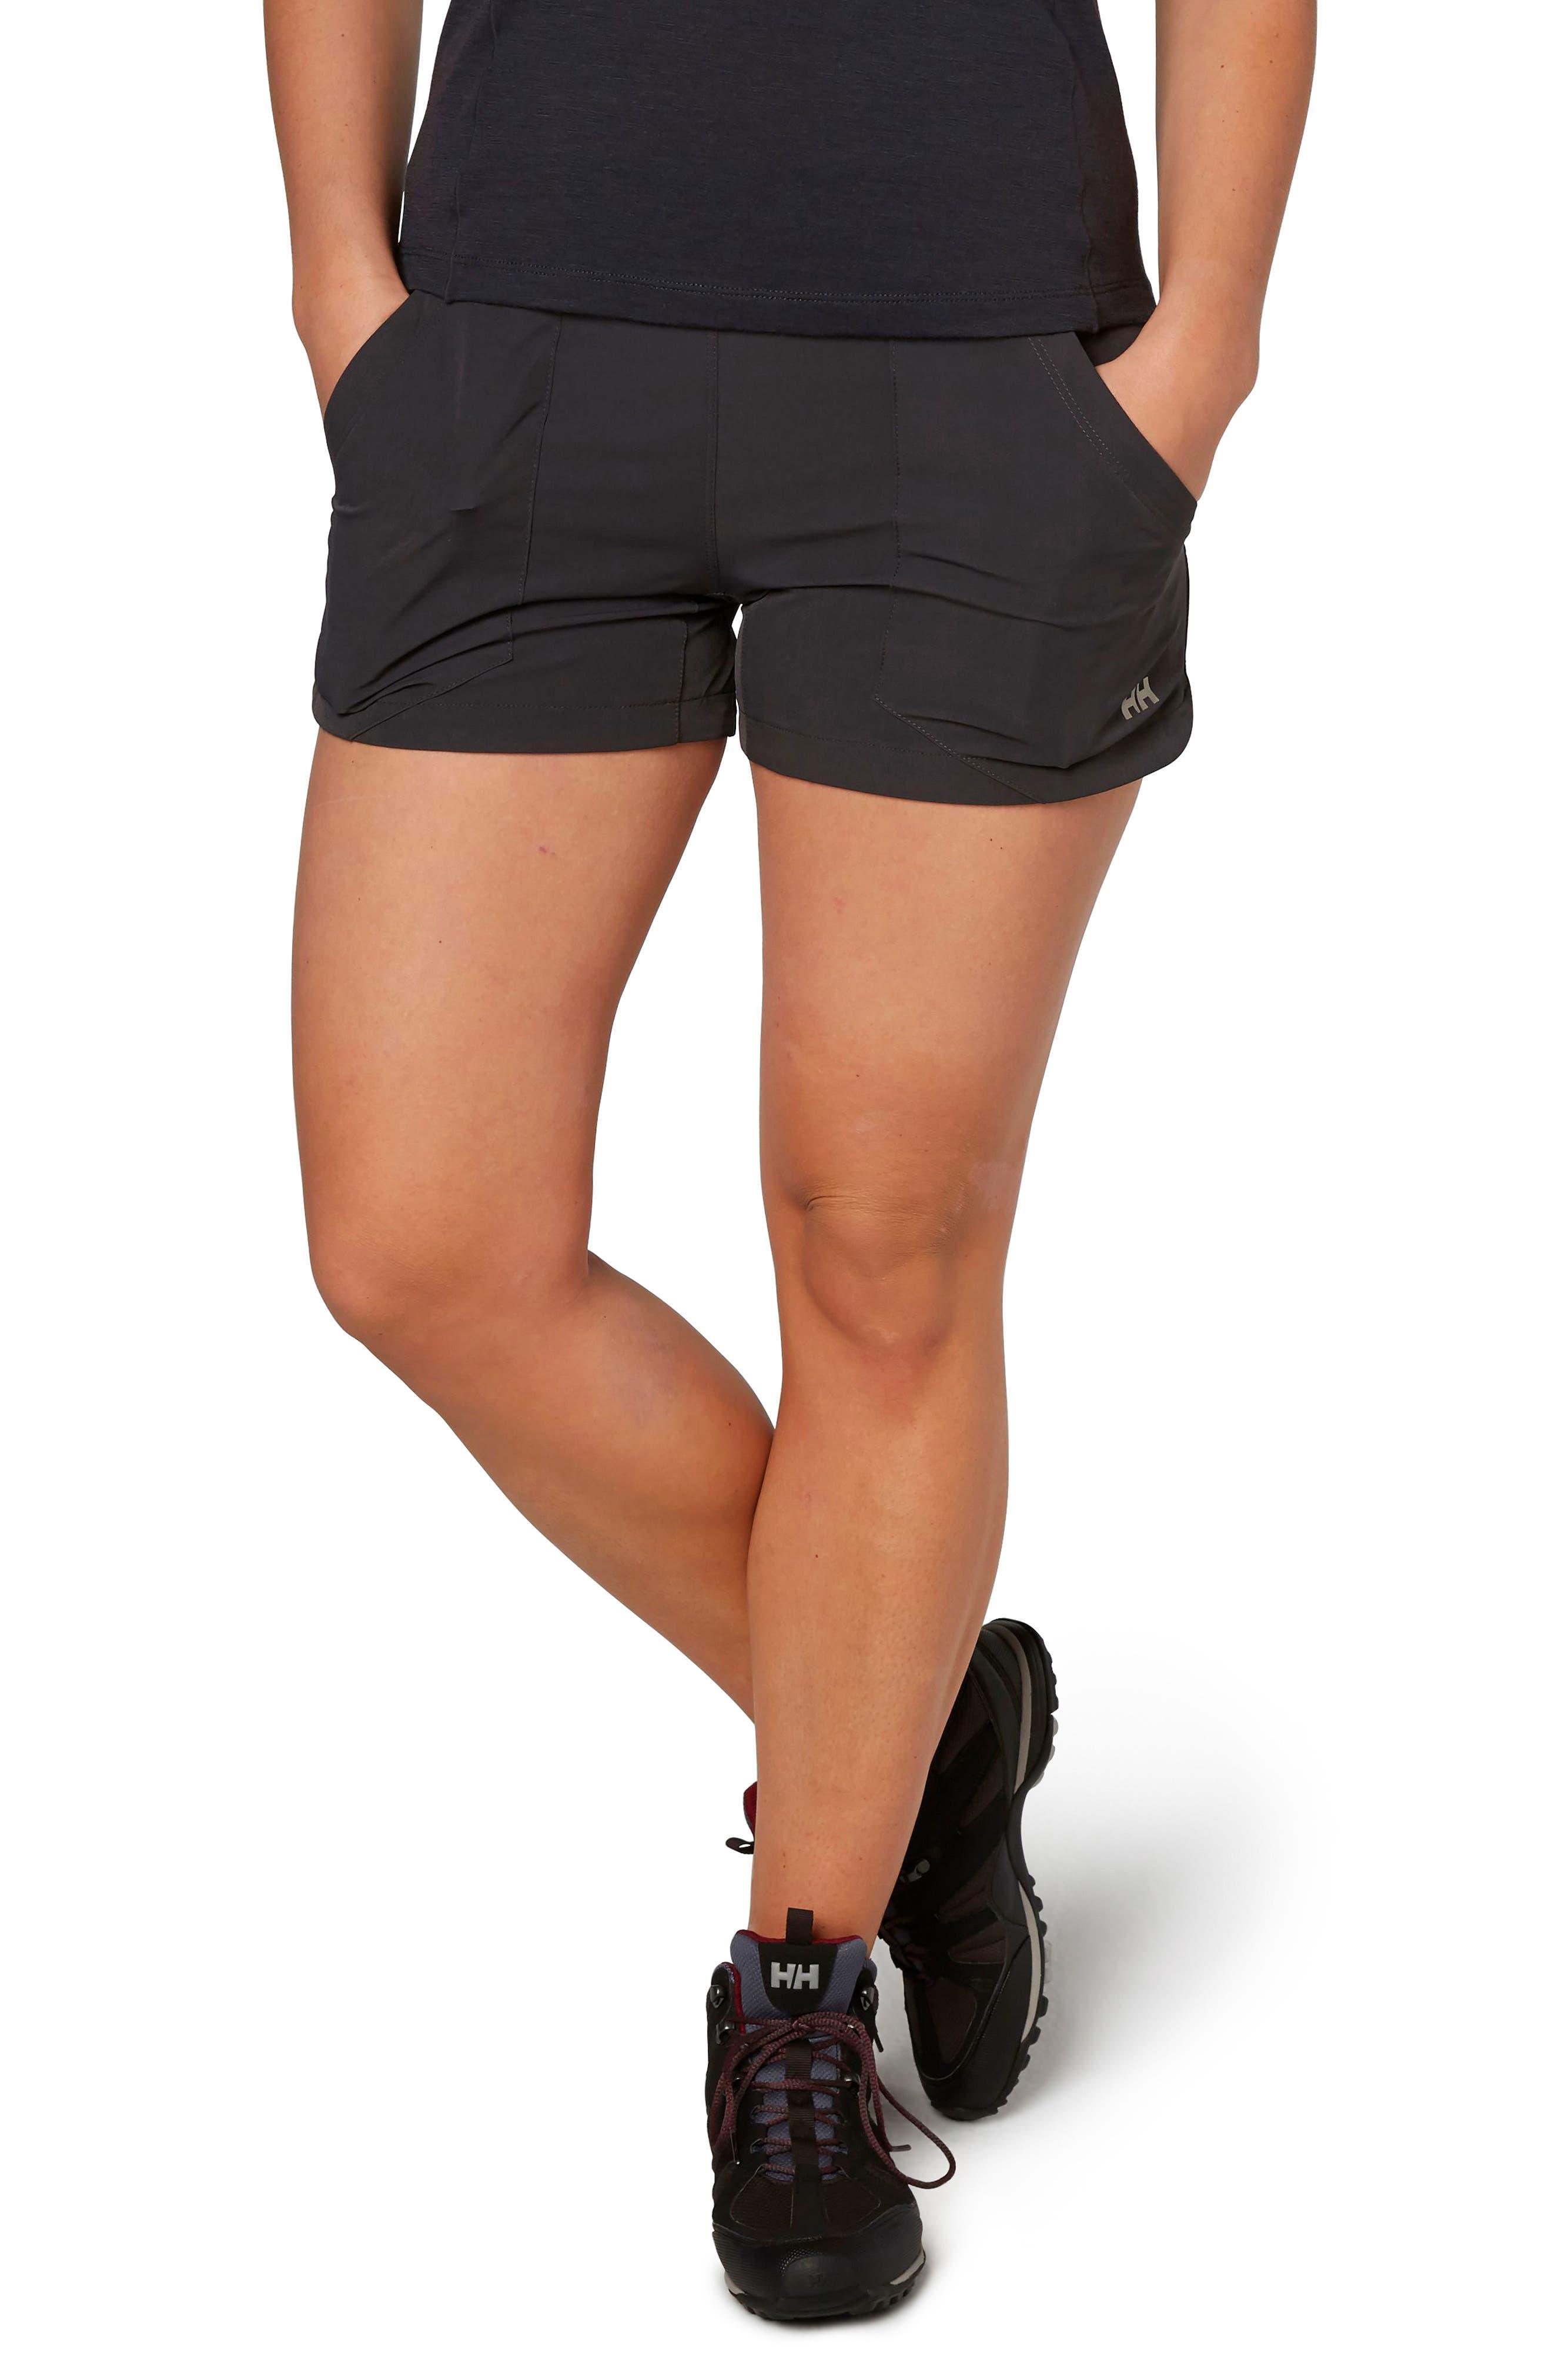 Hild QD Hiking Shorts,                         Main,                         color, 001